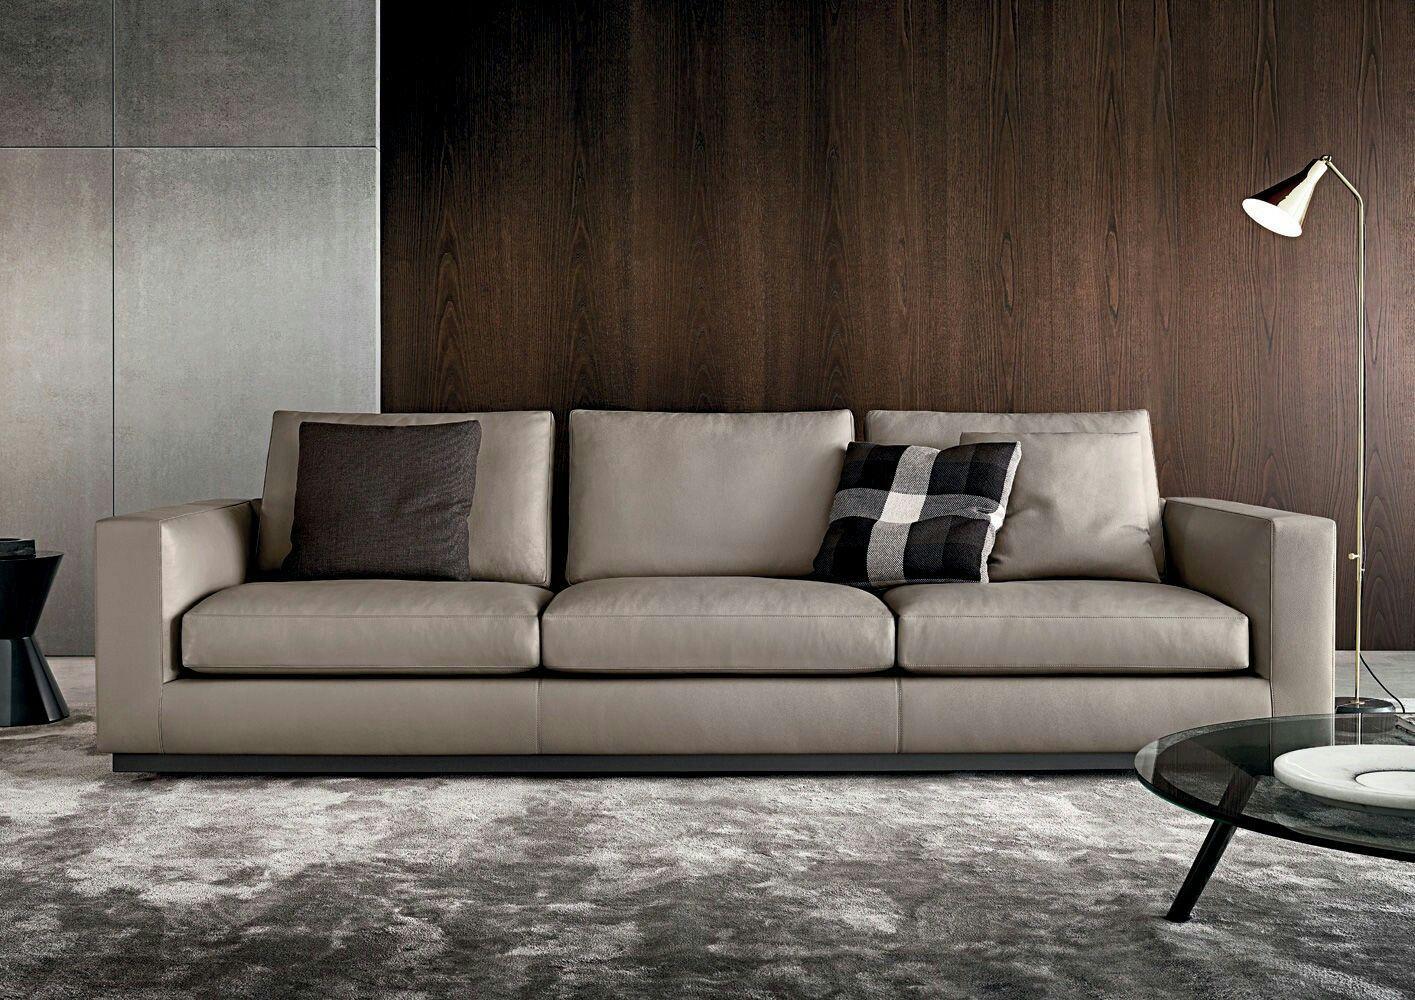 Pin By Tasadamboy Chai On Faverite Sofa Furniture Sofa Design Italian Sofa